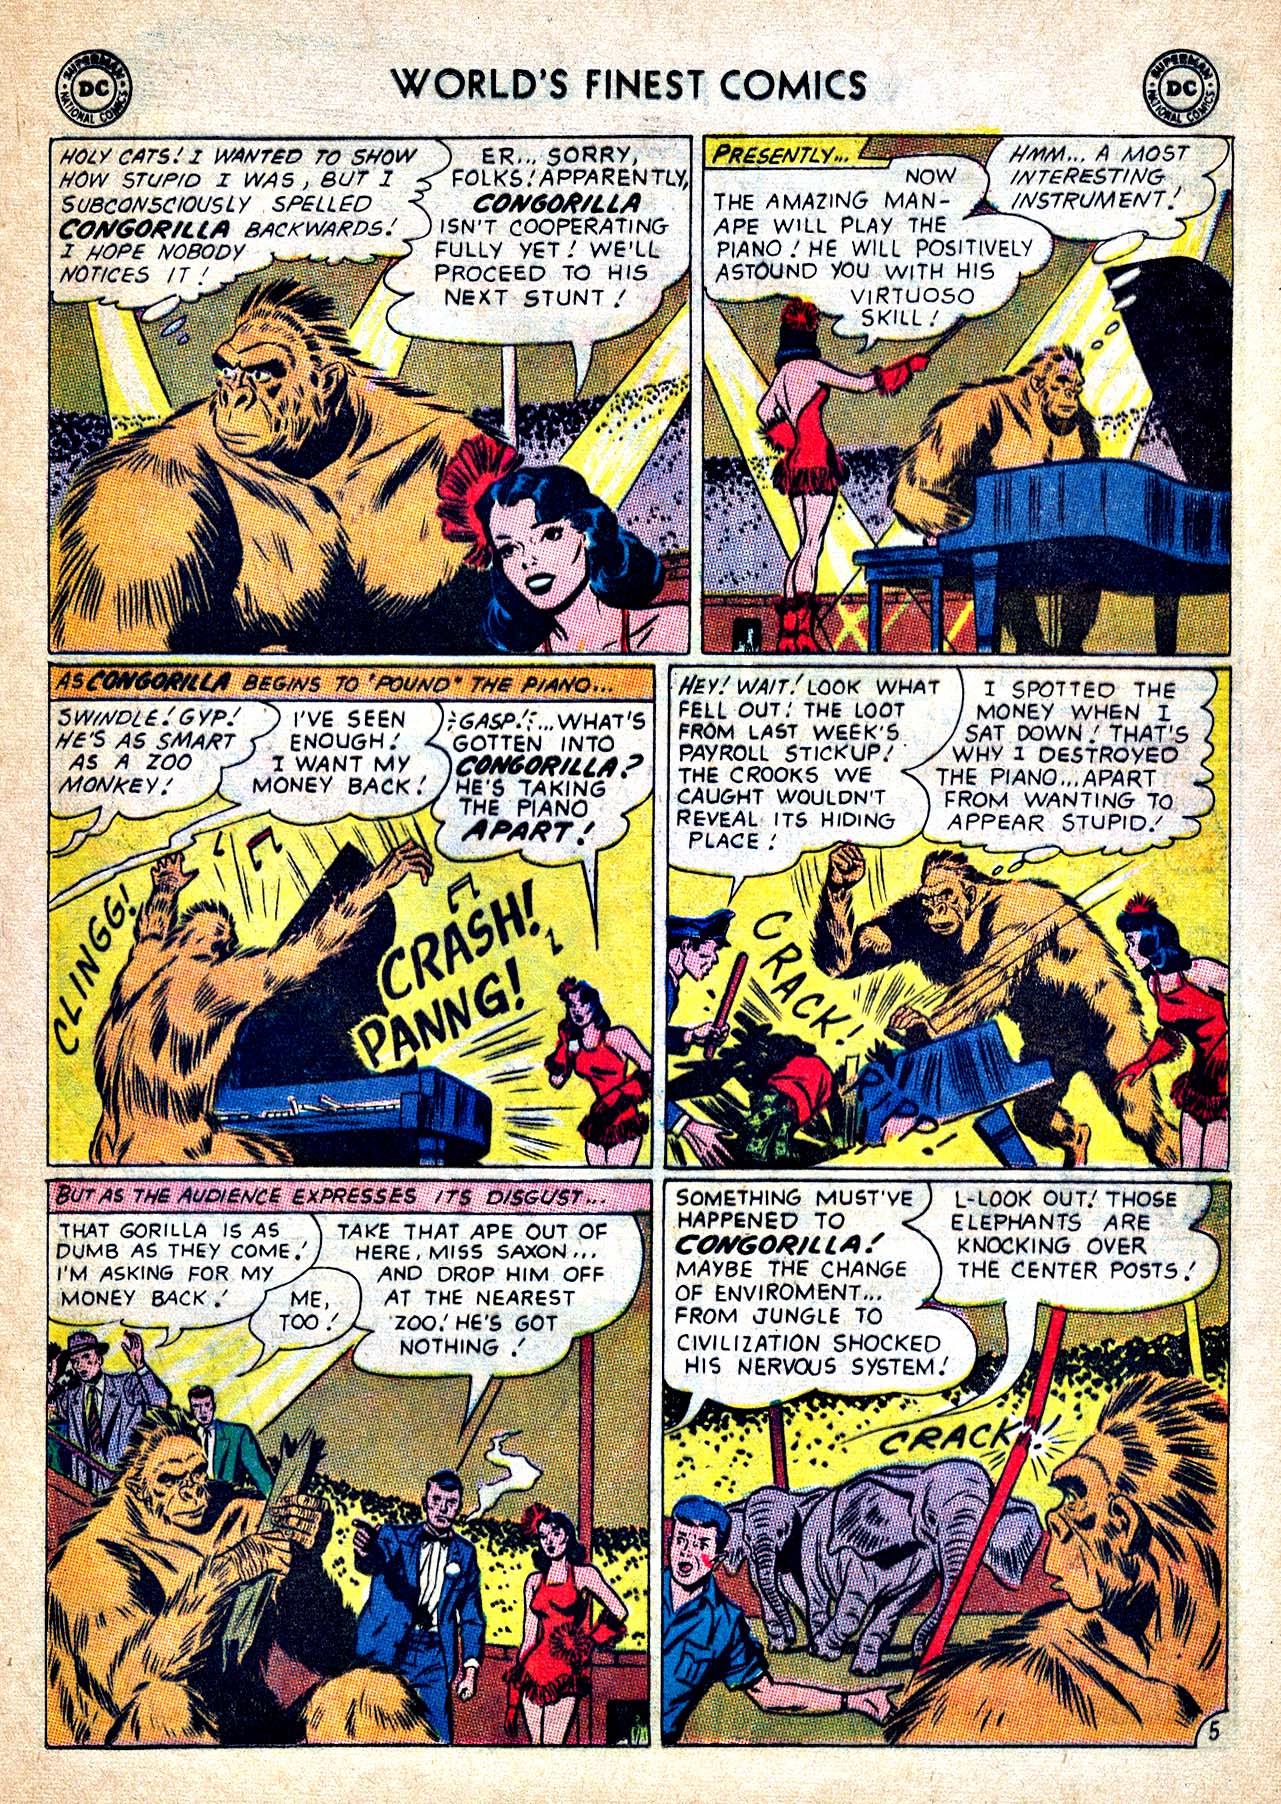 Read online World's Finest Comics comic -  Issue #150 - 29